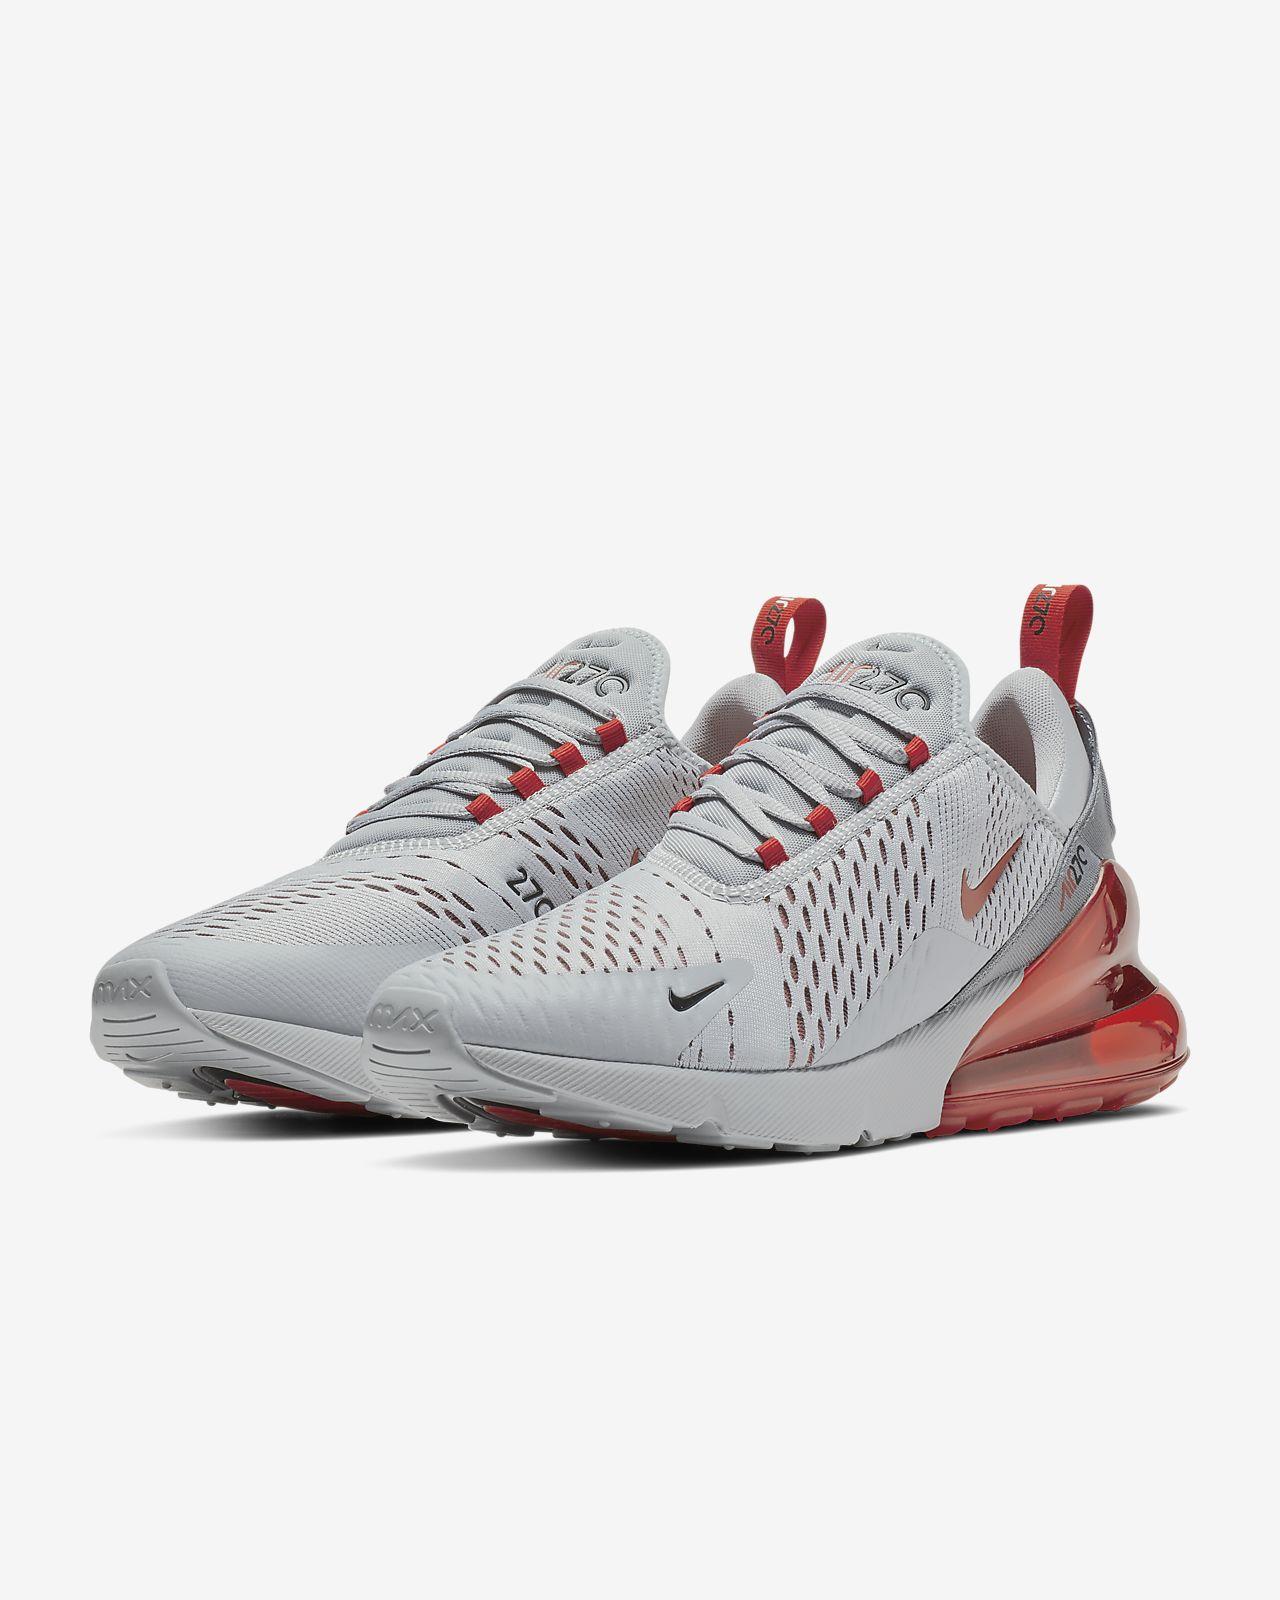 buy popular ebc99 fd135 ... รองเท้าผู้ชาย Nike Air Max 270